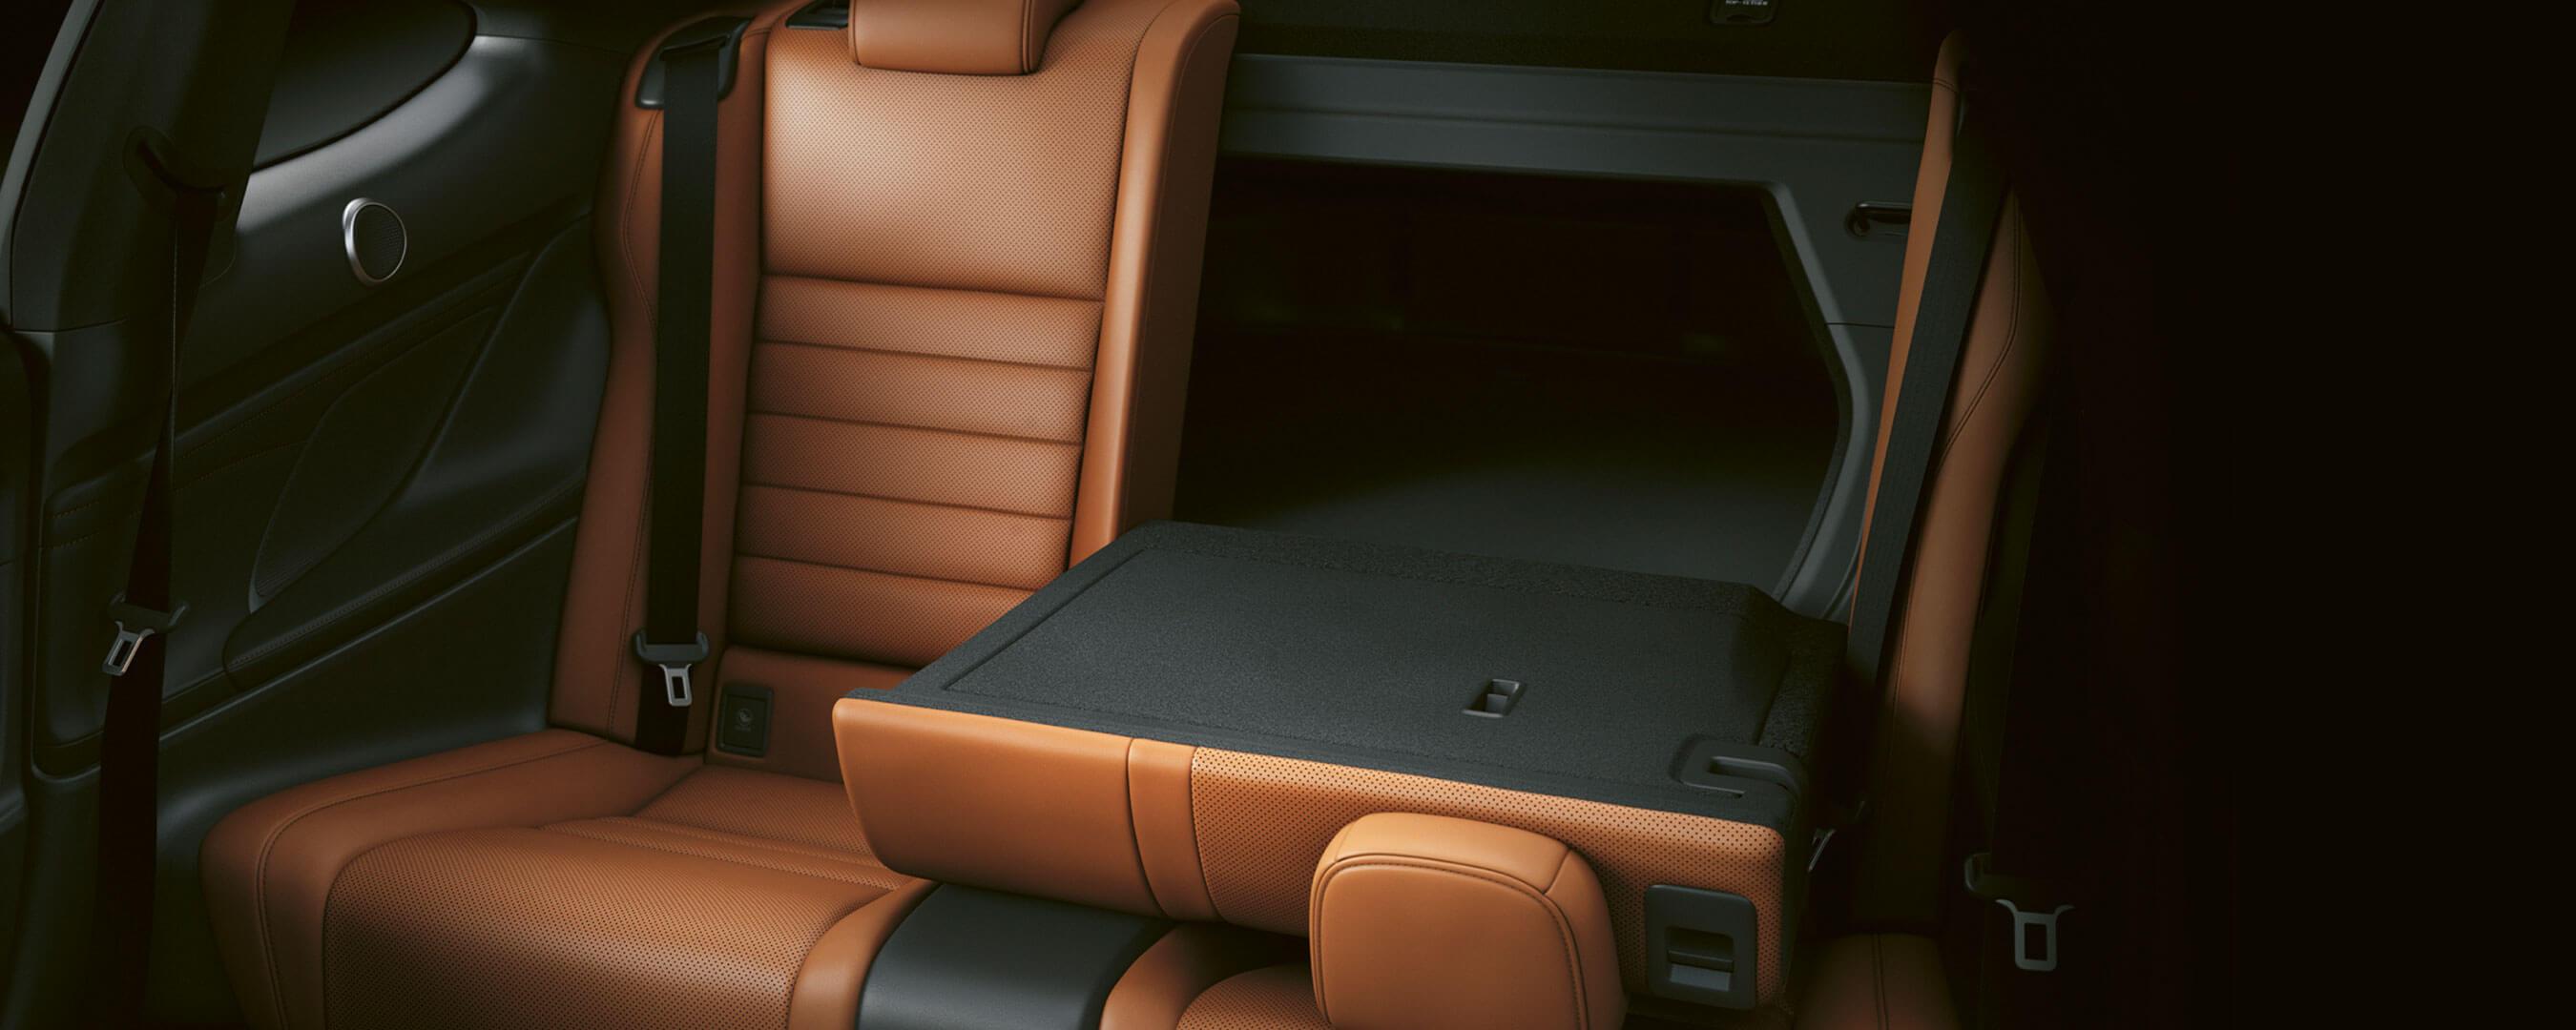 2018 lexus rc experience interior rear